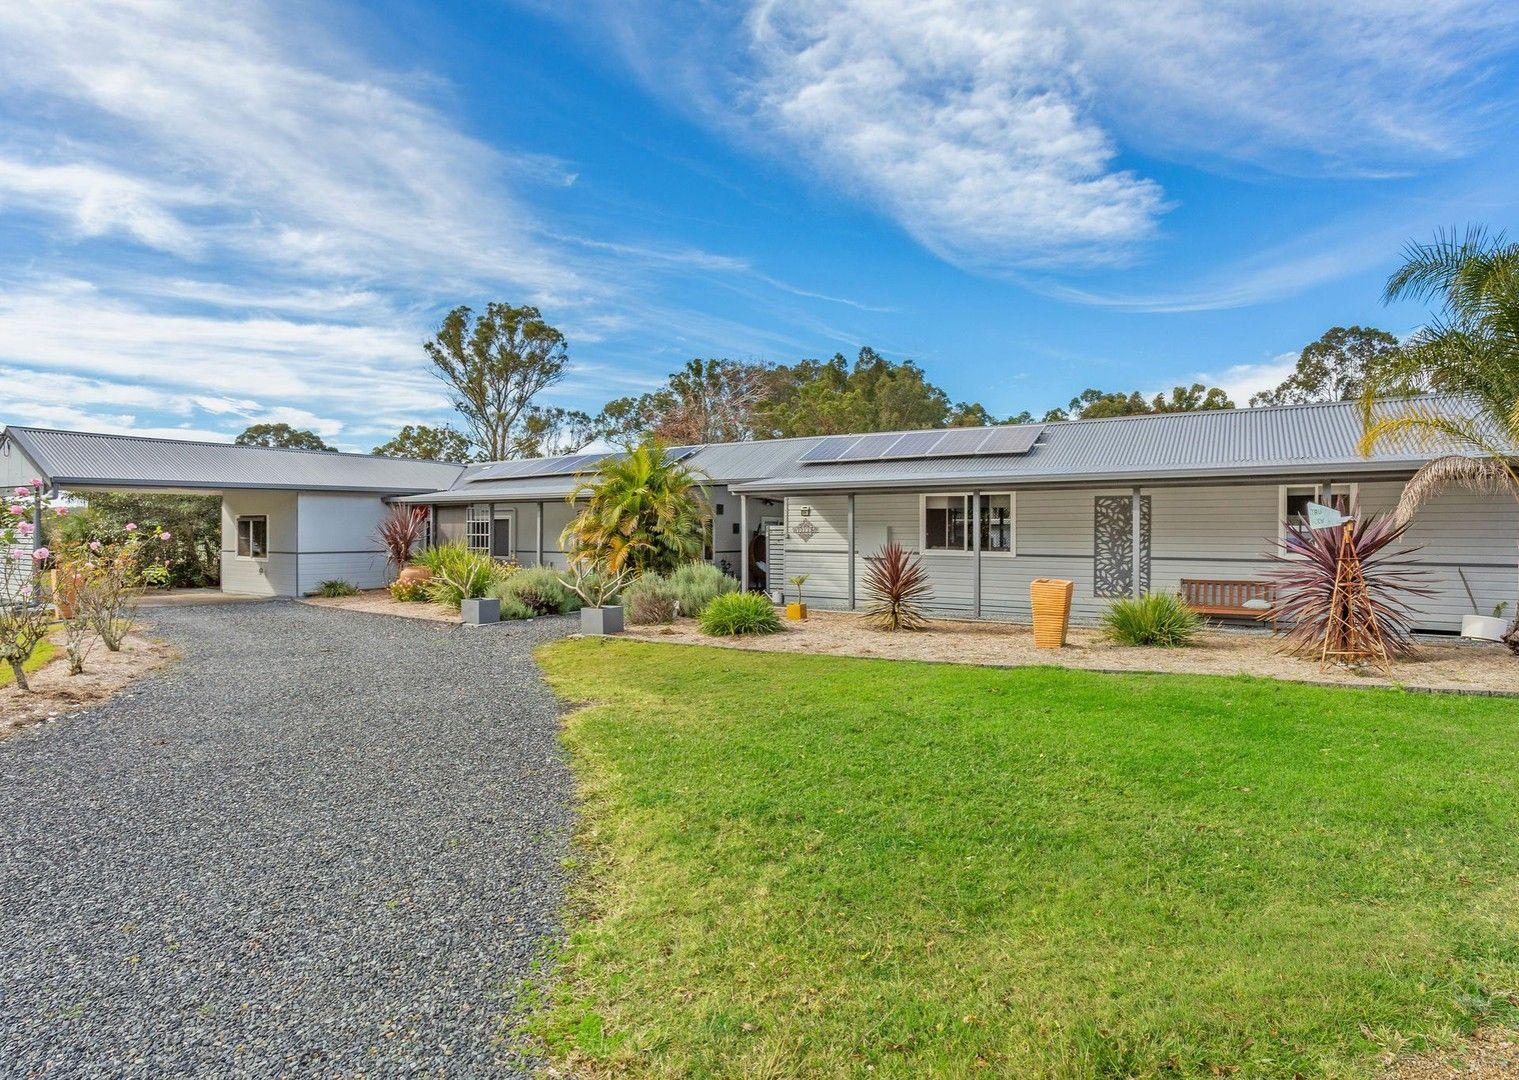 85 Godfrey Hill Road, Koorainghat NSW 2430, Image 0